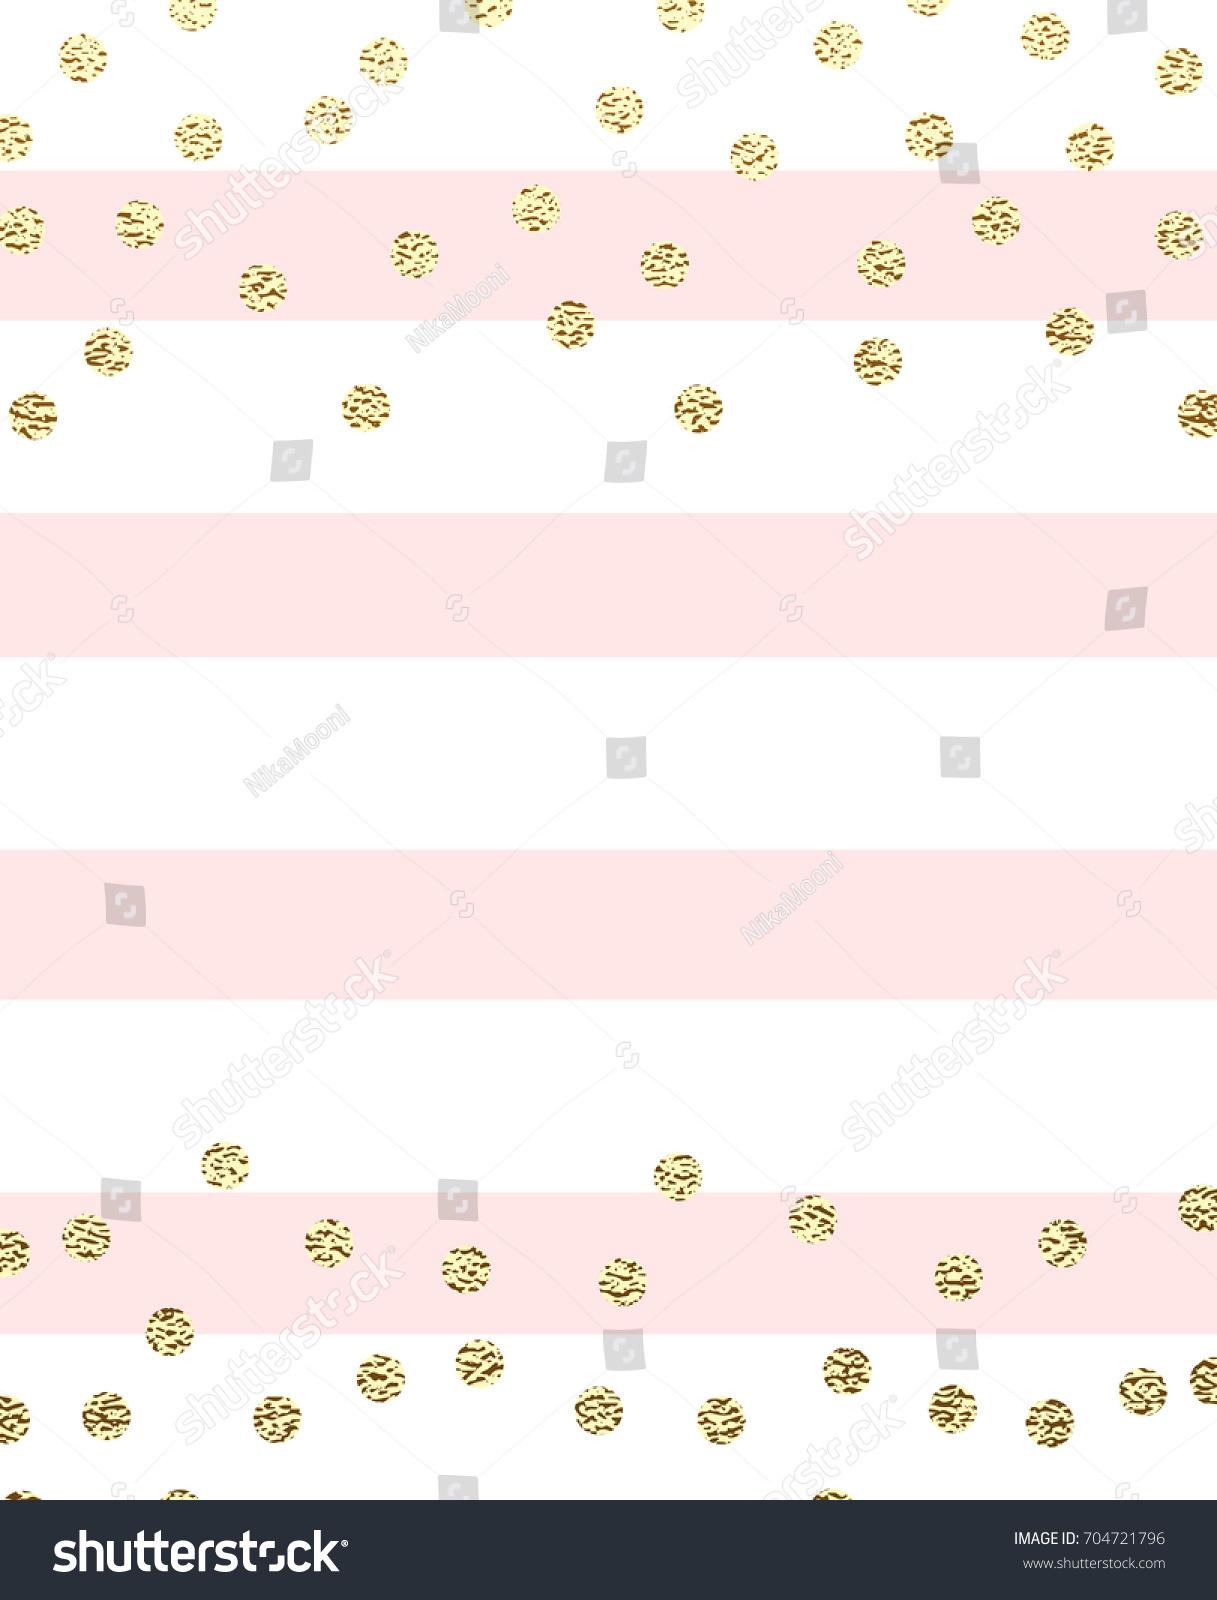 Minimalist invitation design gold glitter circles stock vector 2018 minimalist invitation design with gold glitter circles and pink stripes stopboris Images